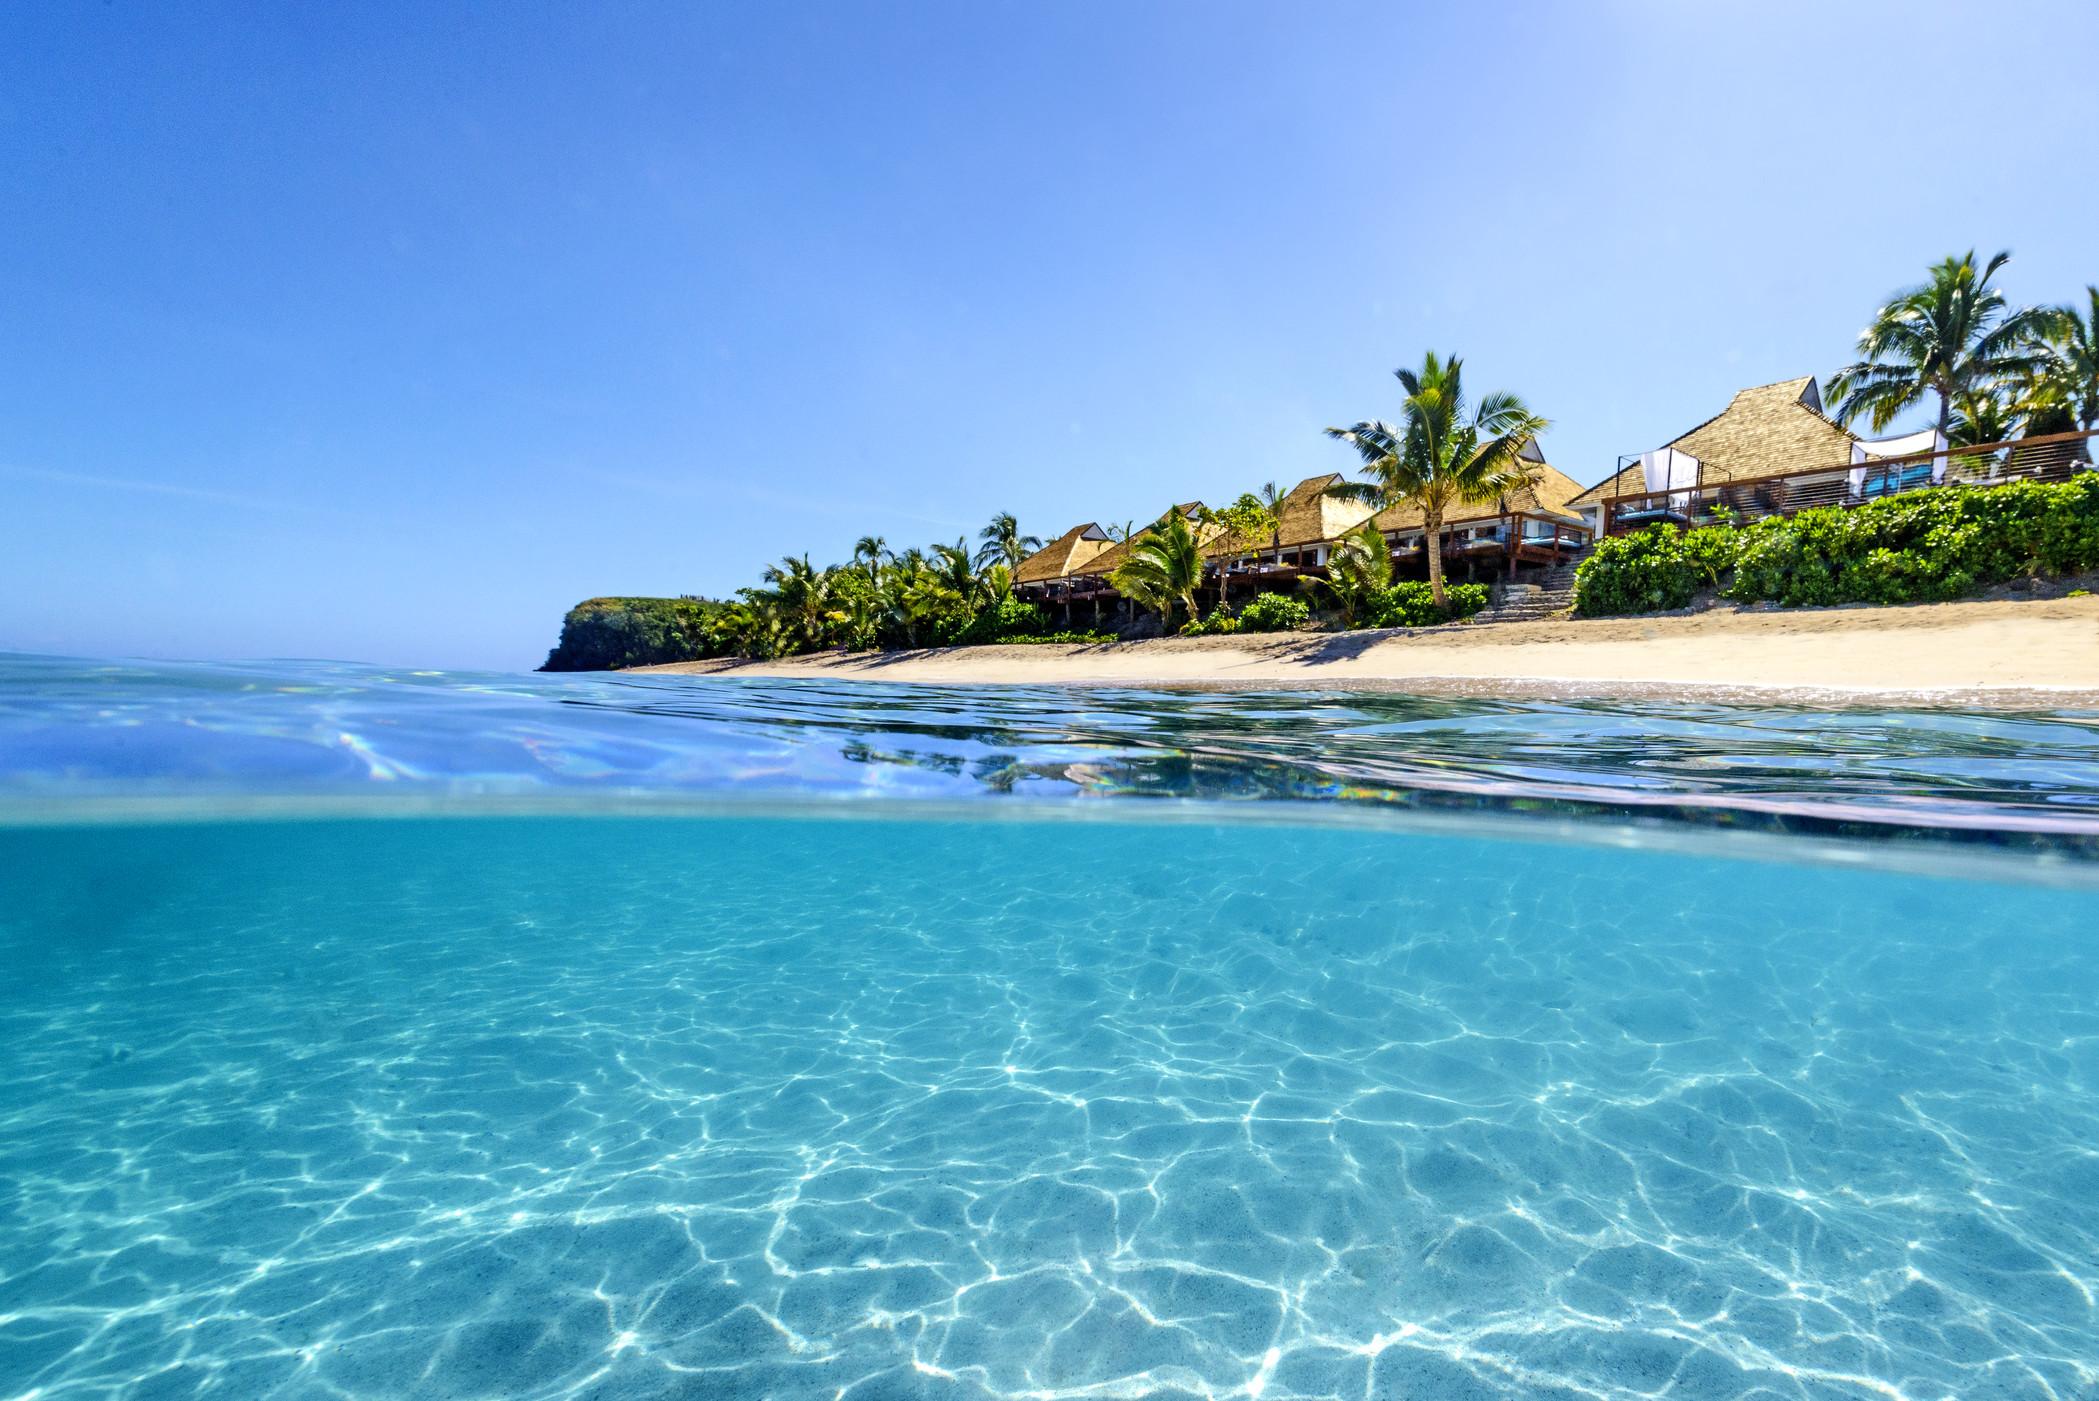 Subscribe CruisePassenger-Fiji Holiday